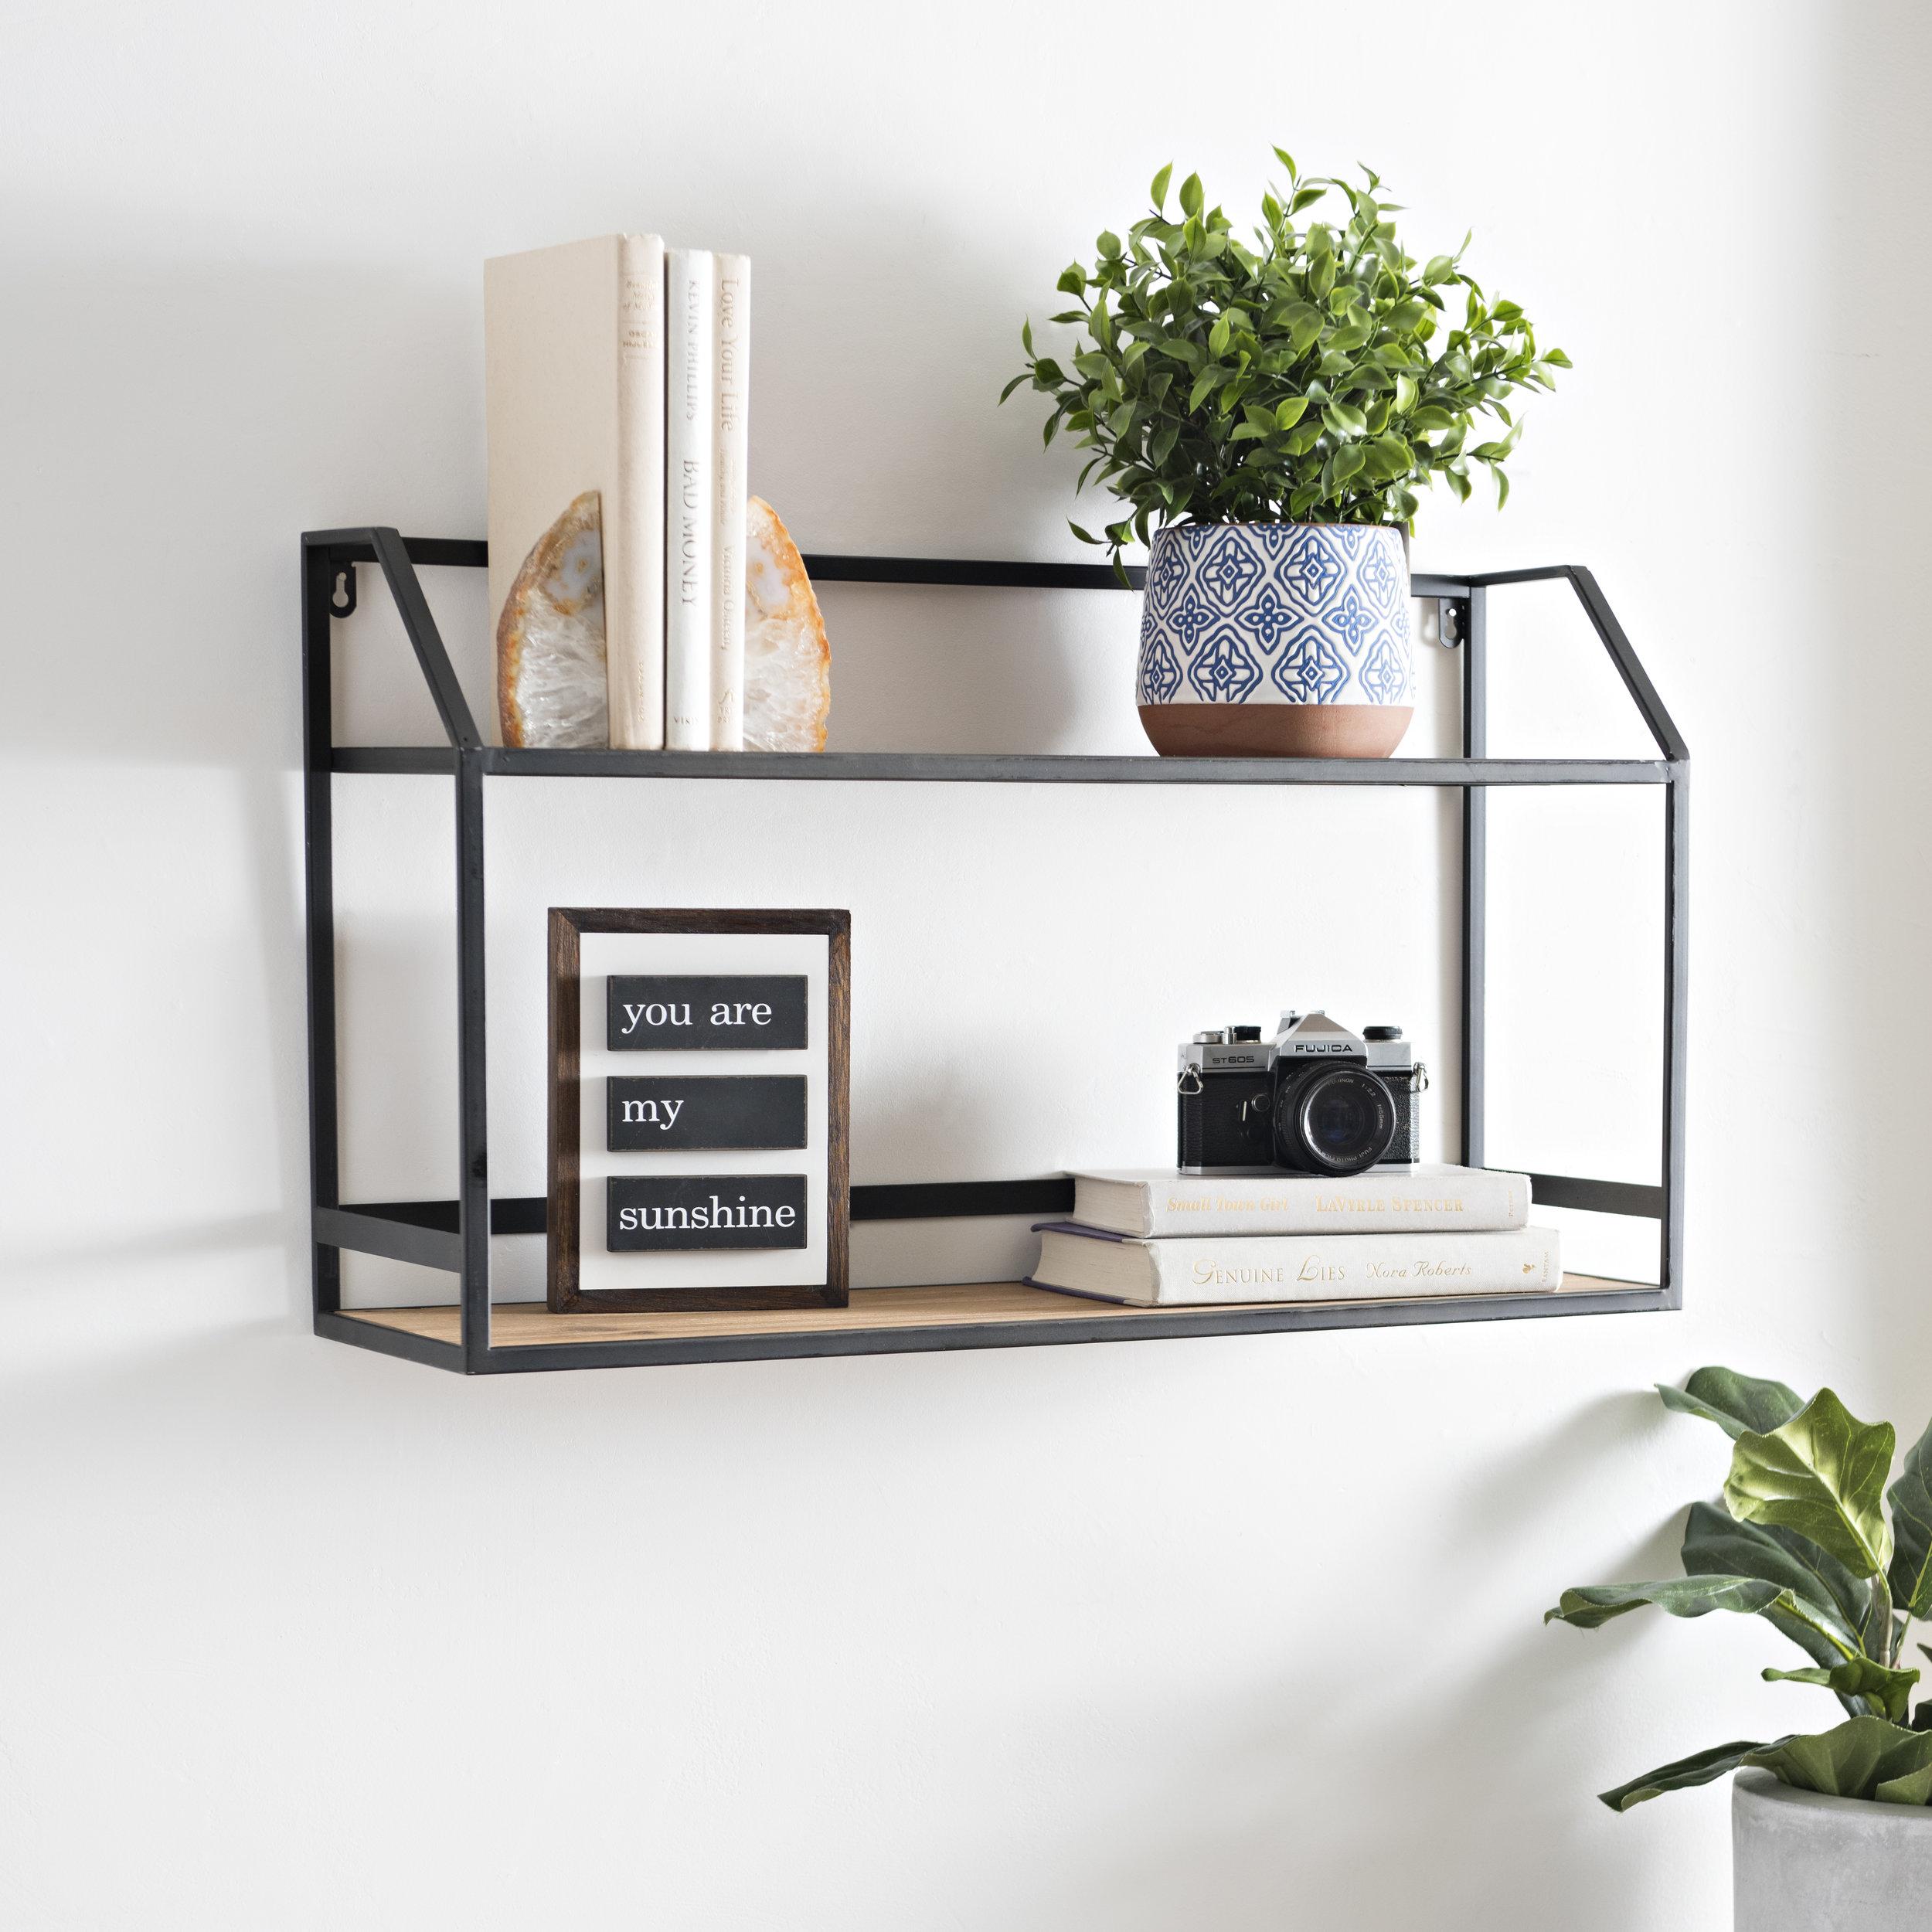 Kirkland's - Wood and Metal Double Shelf Unit